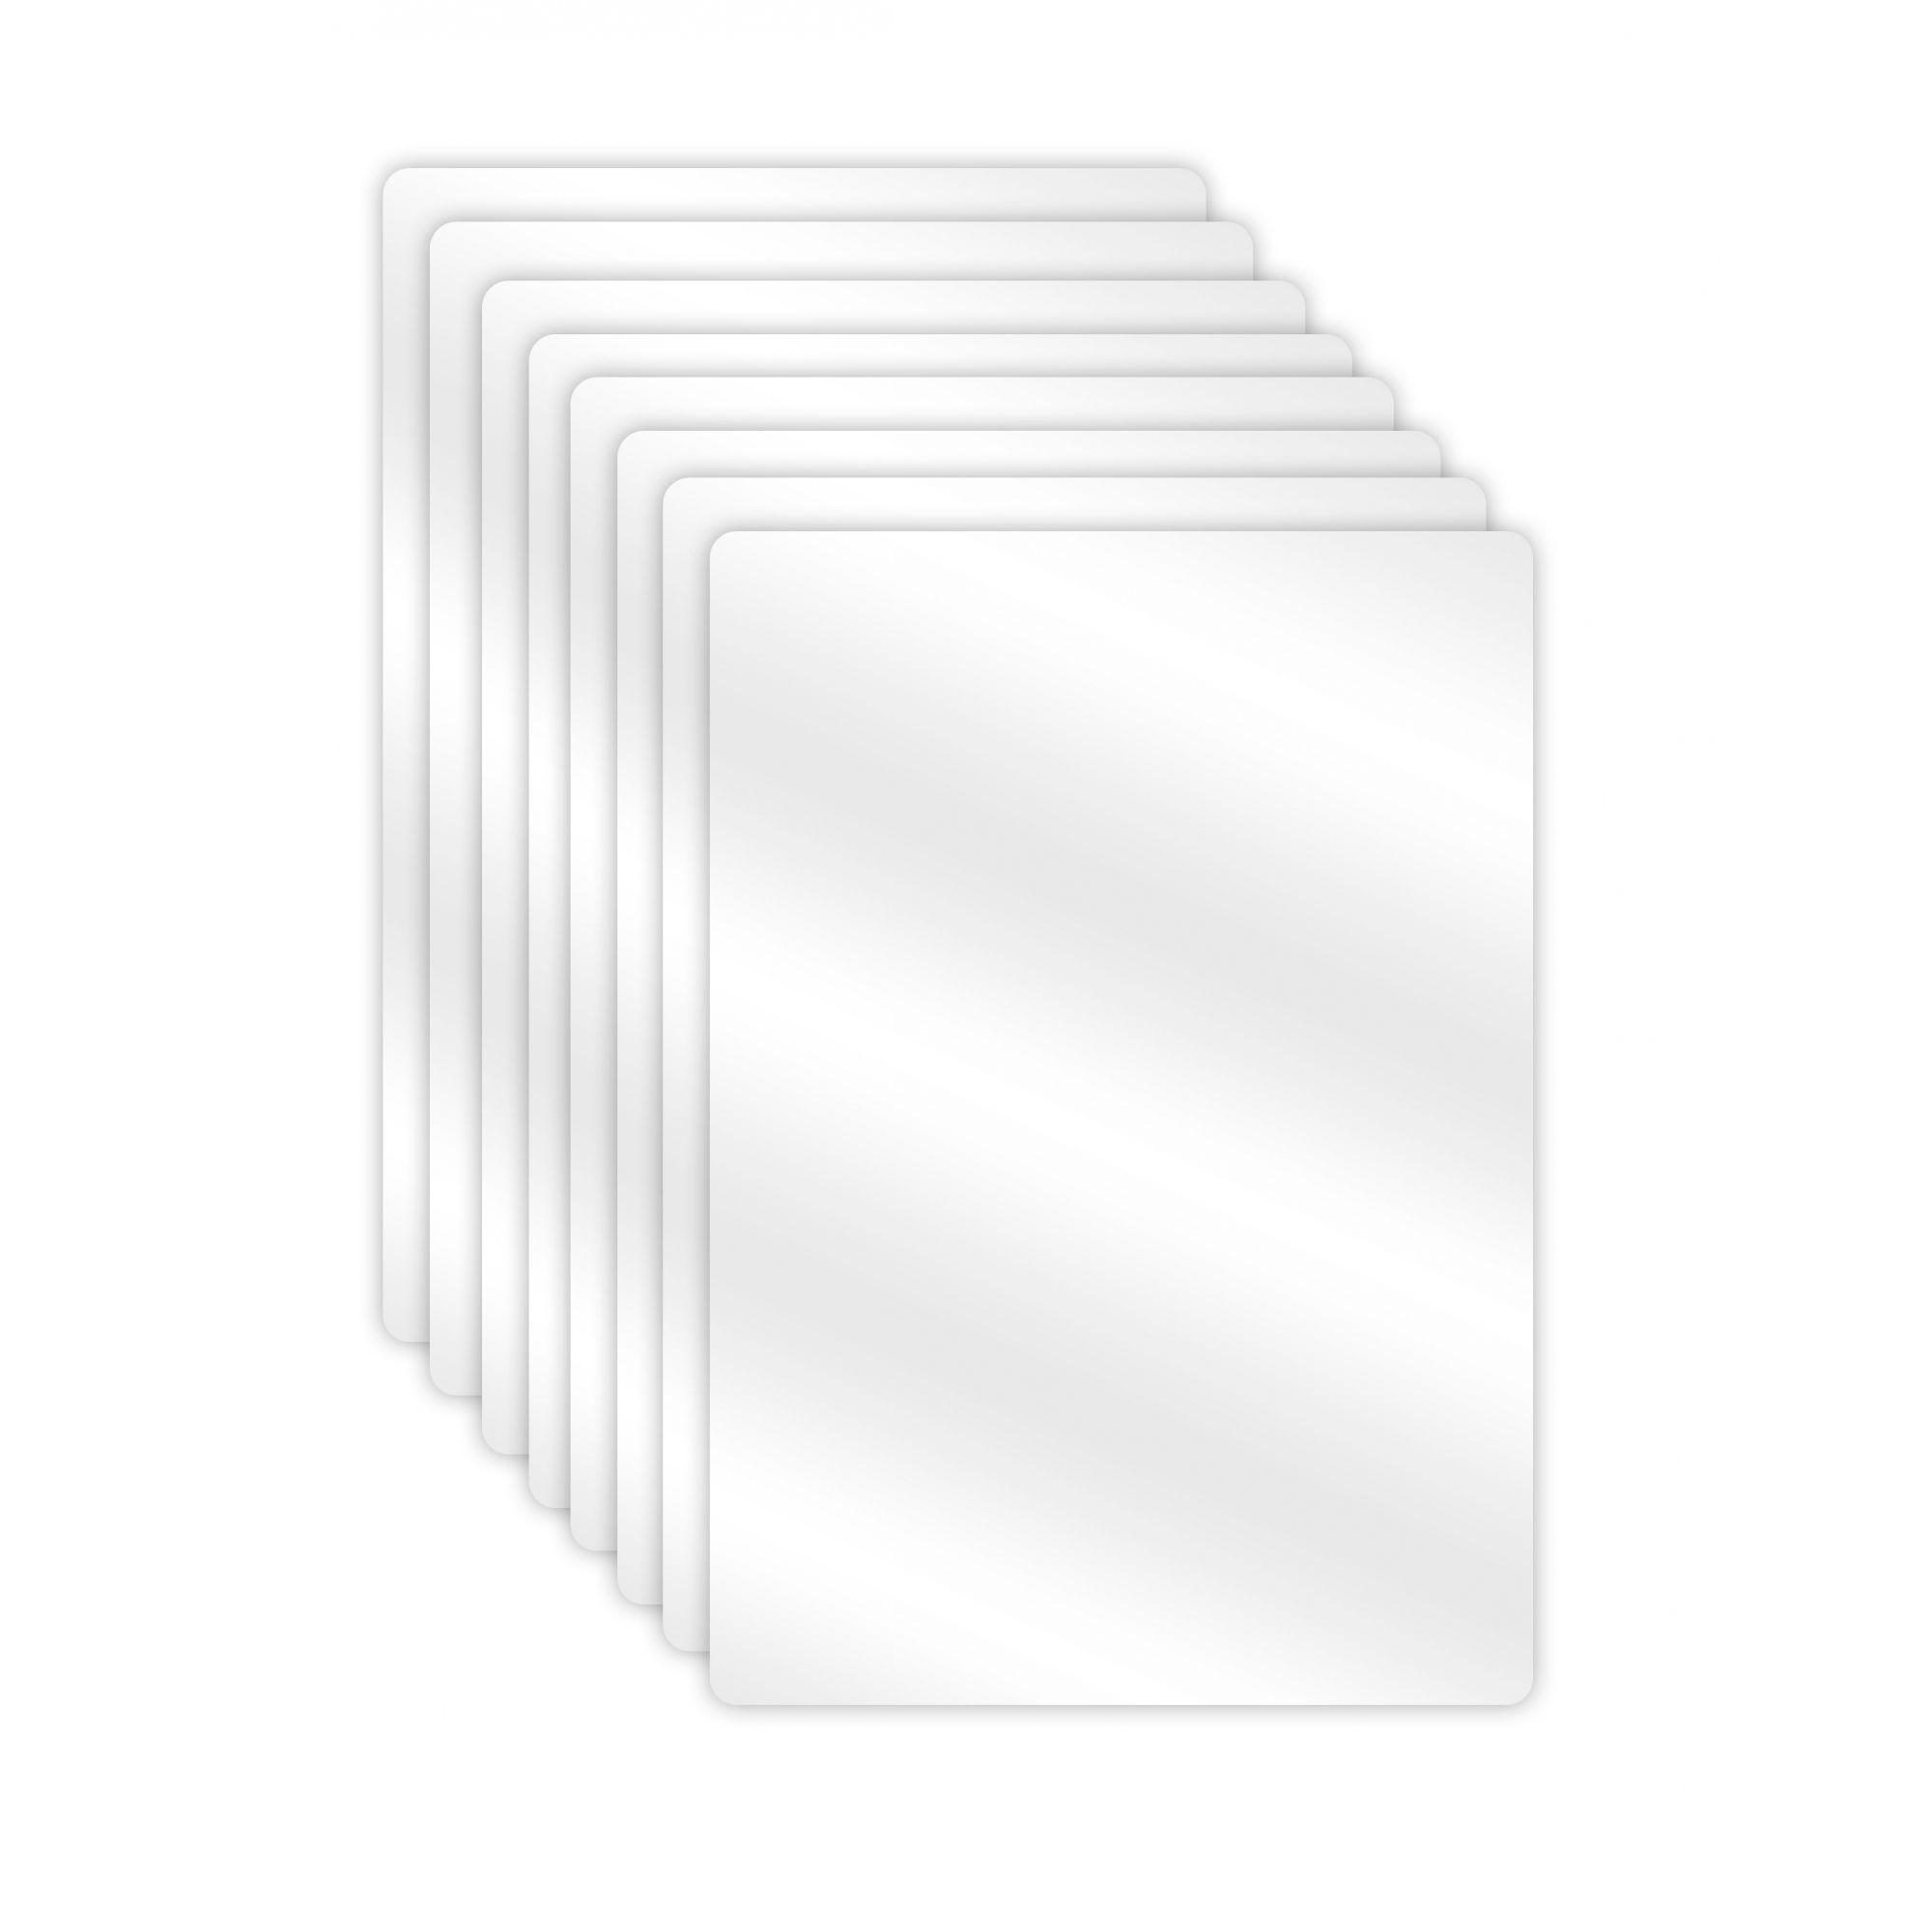 Kit 10 Plásticos de Plastificação - JuJu Scrapbook  - JuJu Scrapbook